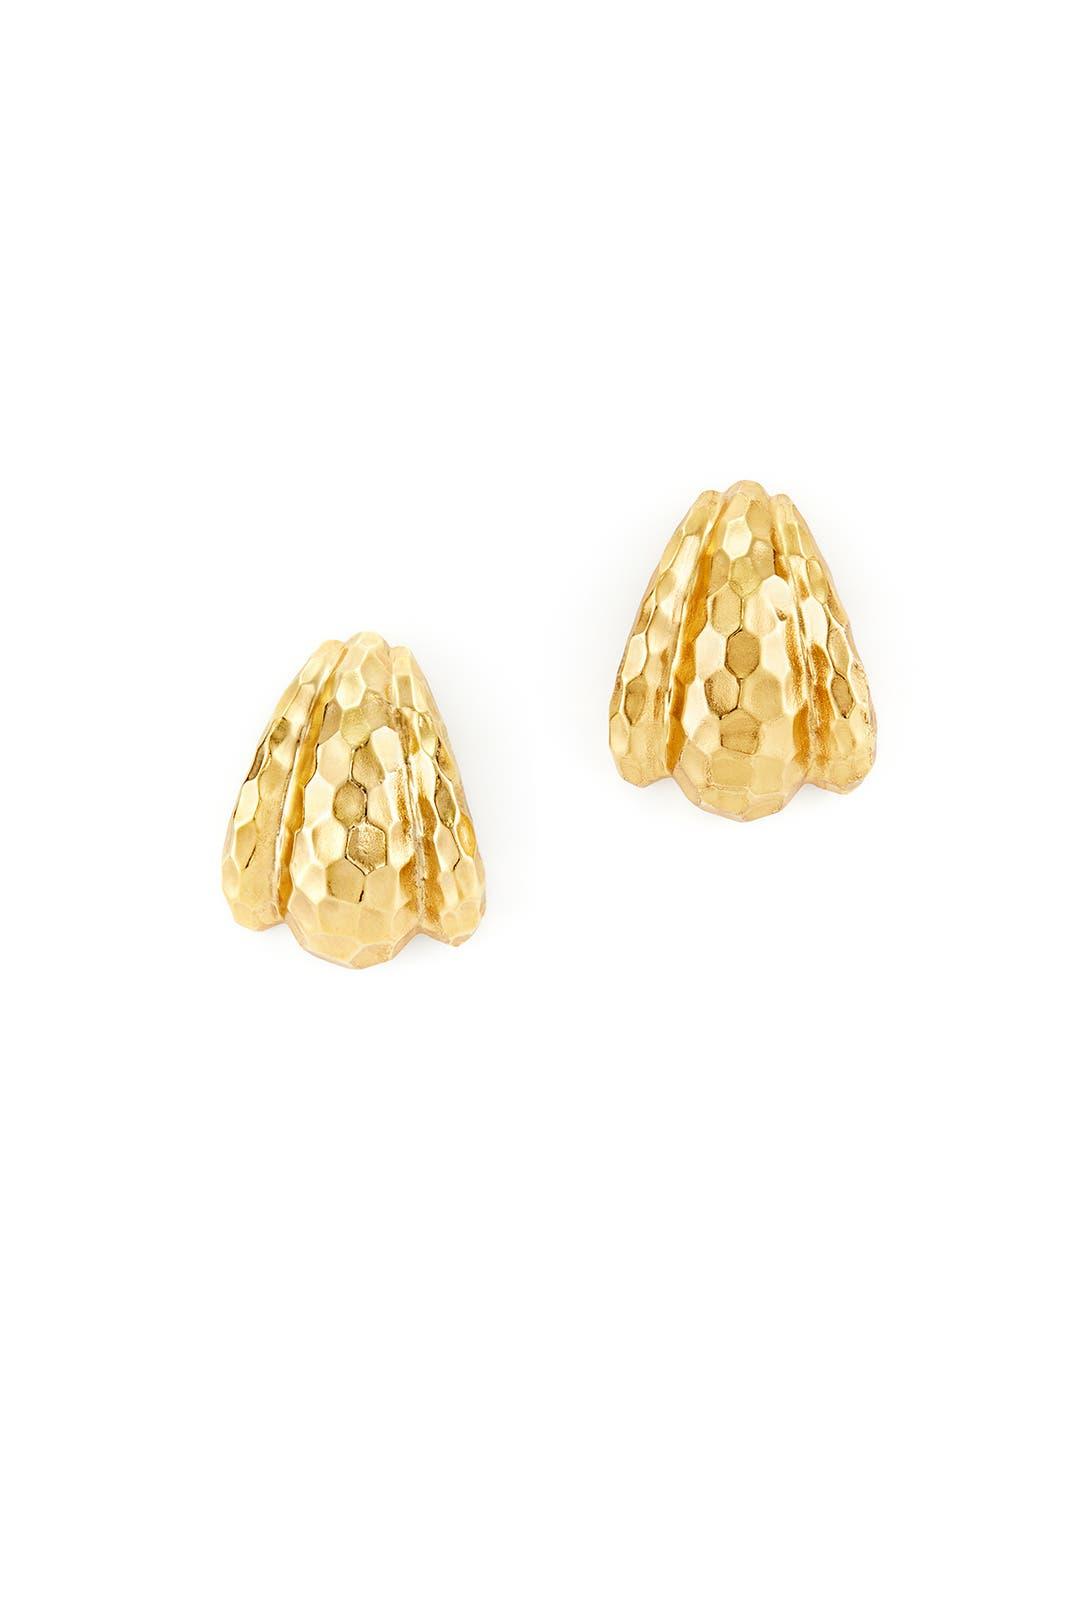 Honeycomb Stud Earrings by Ben-Amun